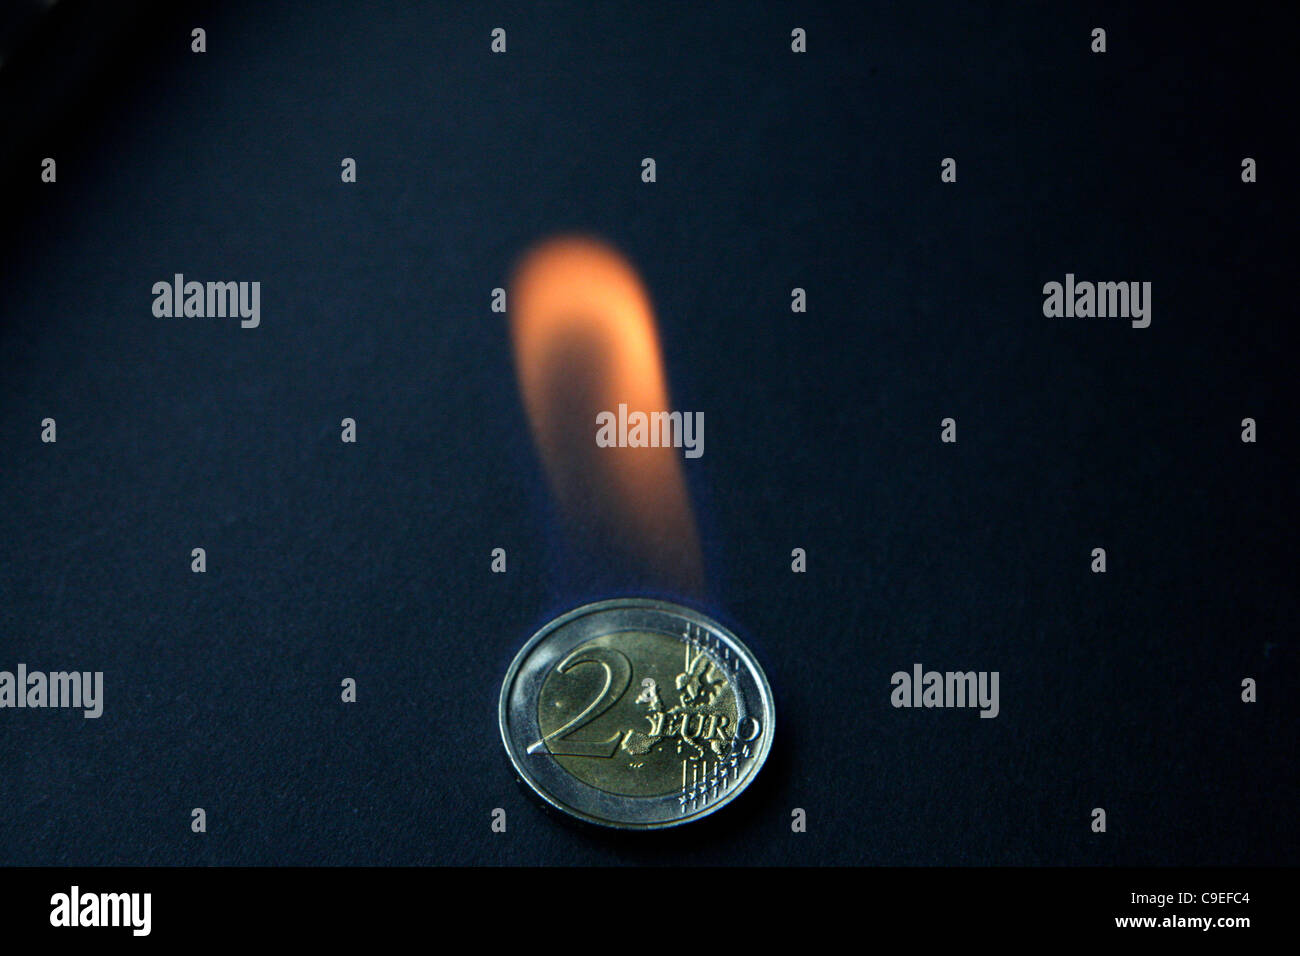 7 December 2011 Athens Greece. Euro Zone Crisis - Stock Image